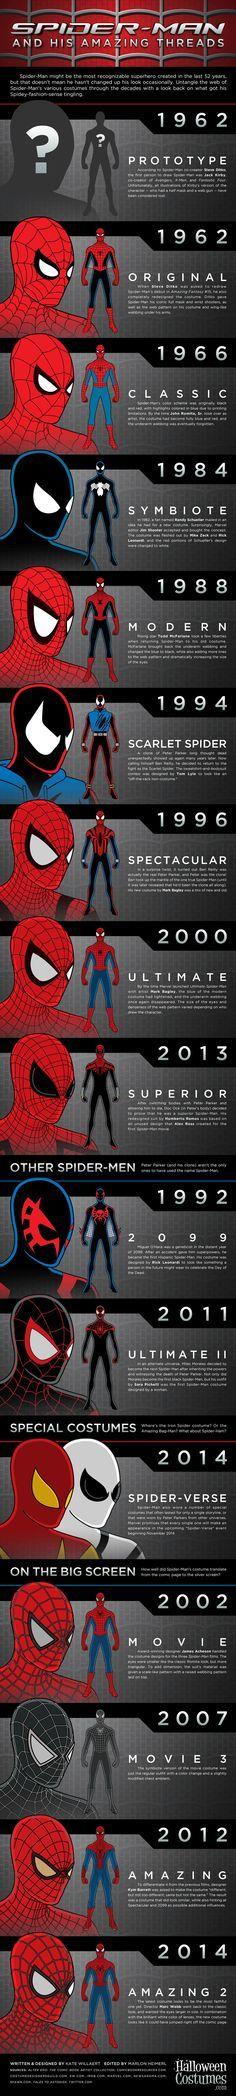 Spider-man Uniforms ---as far as im concerned, hi IS an avenger! viva spidey!!